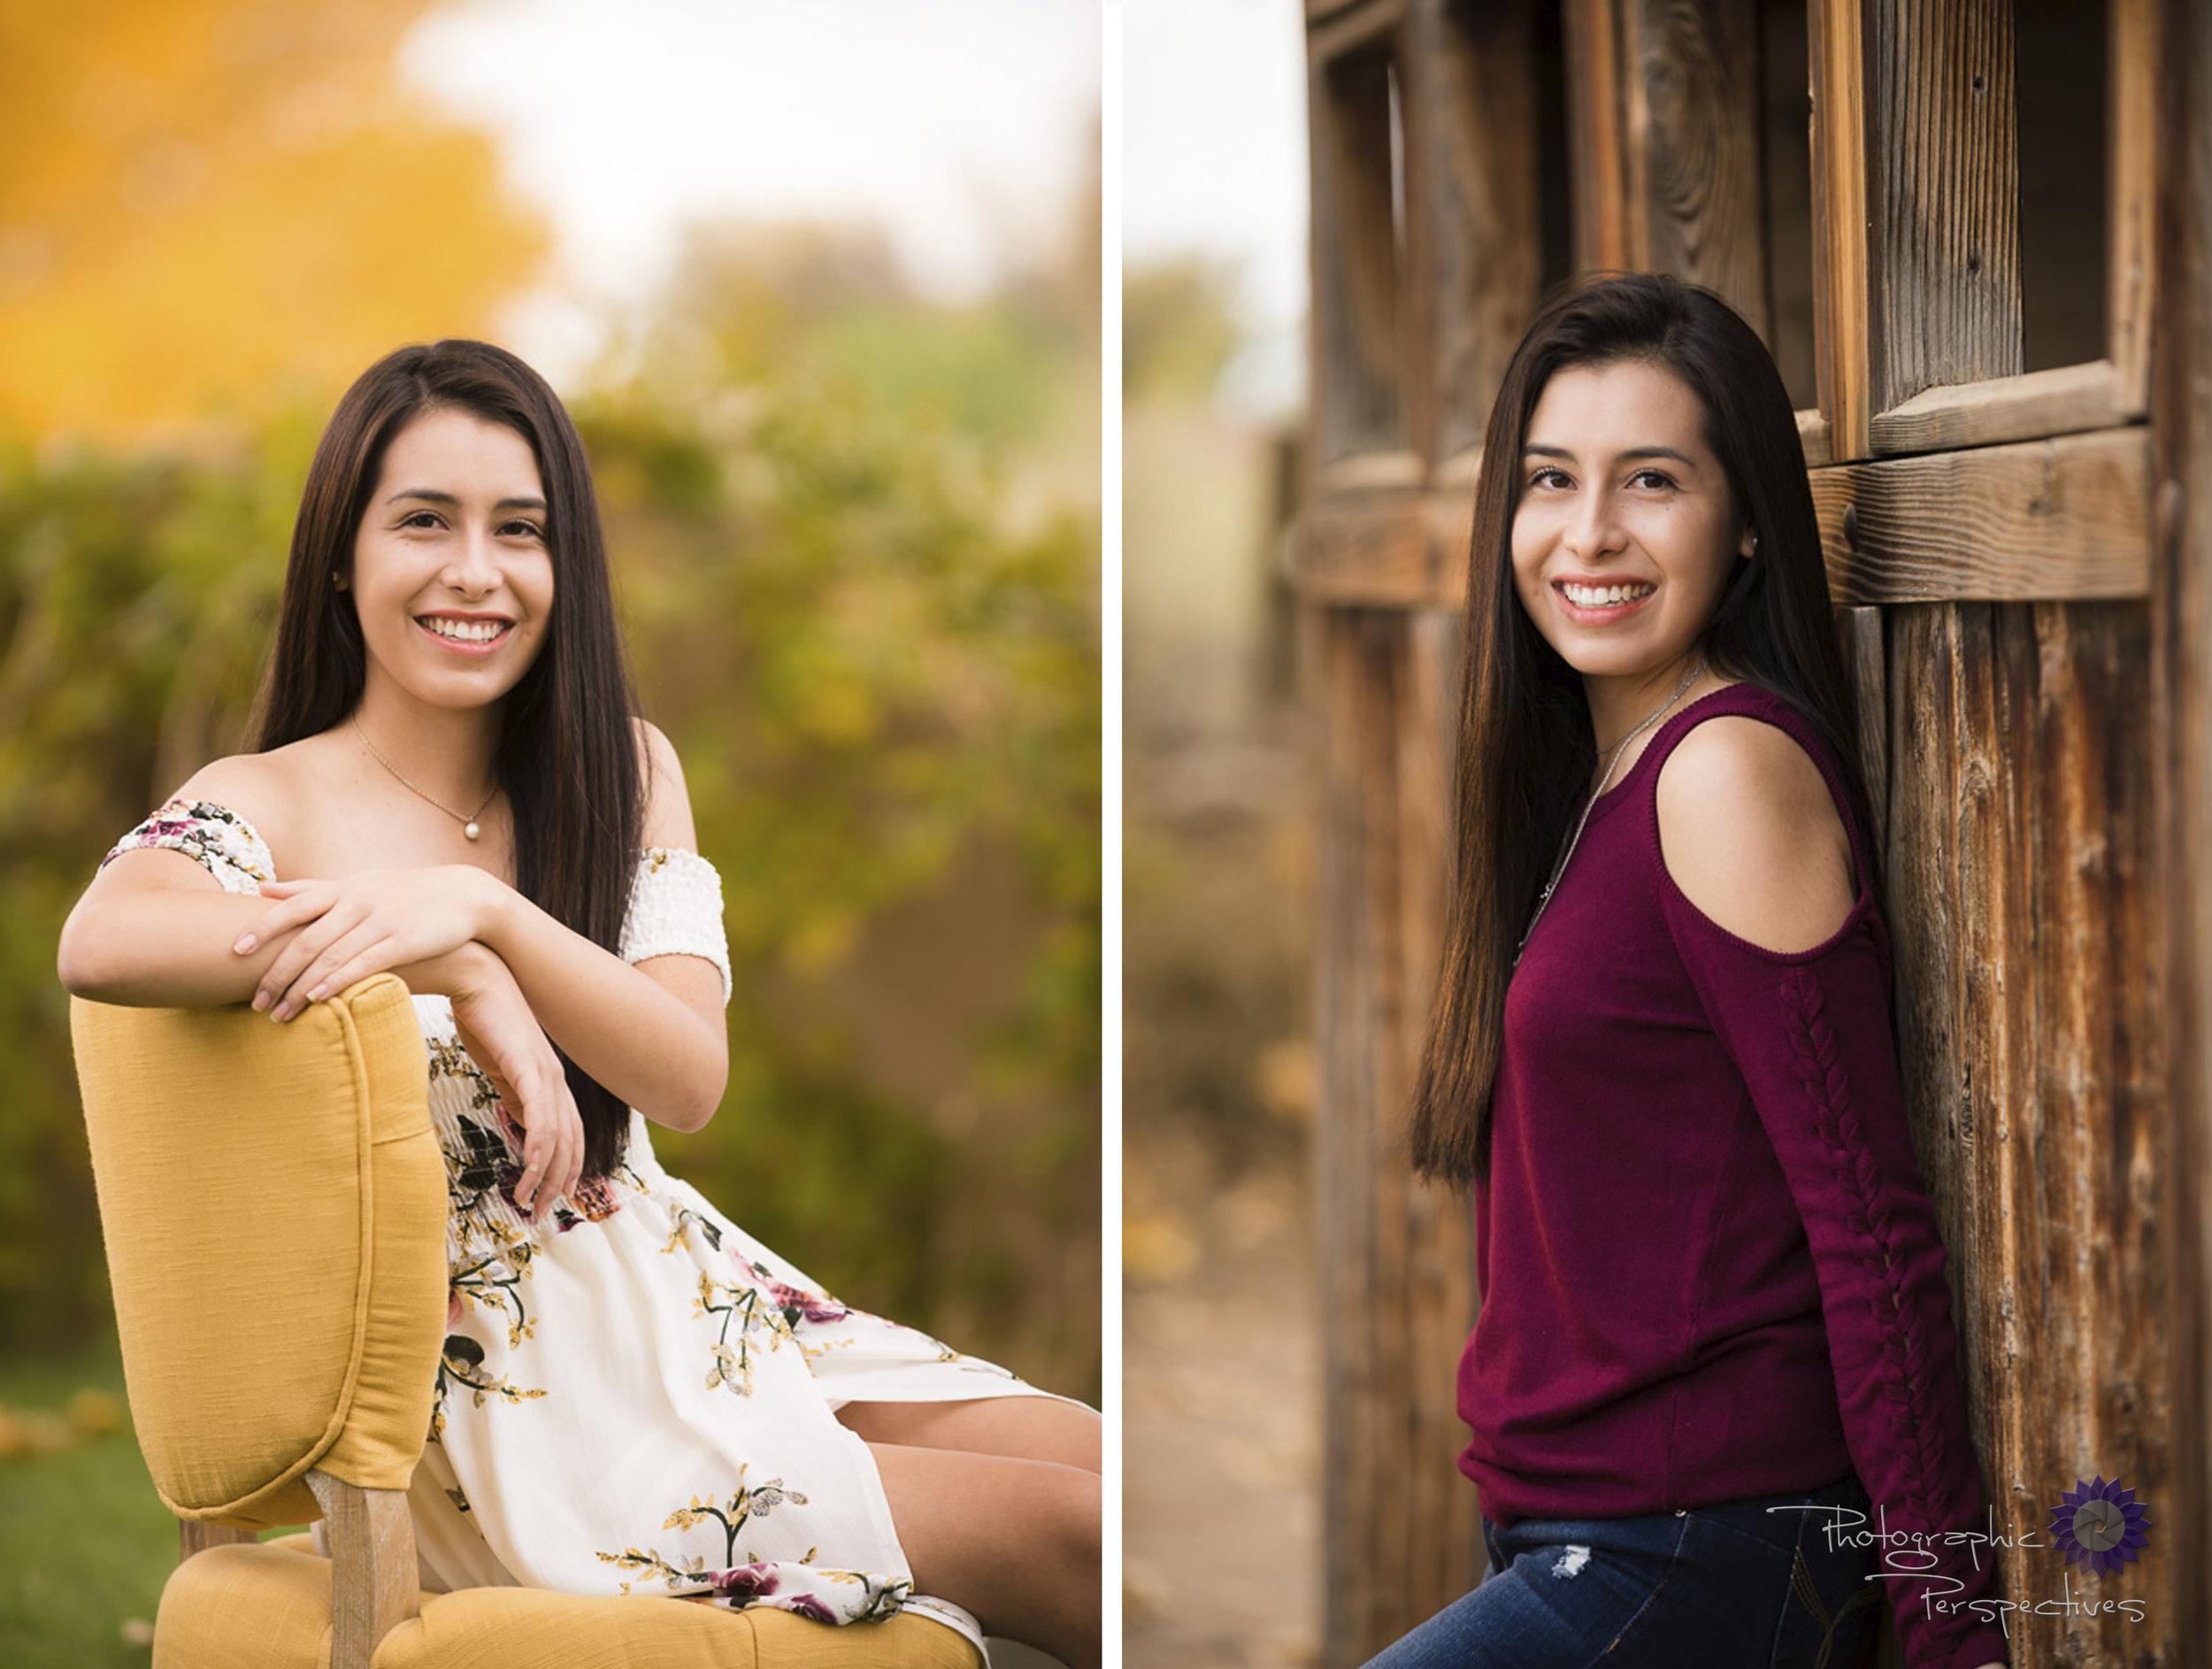 Photographic Perspectives | Senior Portraits | Corrales New Mexico | Fall Senior Portrait Session | Albuquerque Photographers | Senior Portrait Photographer Albuquerque